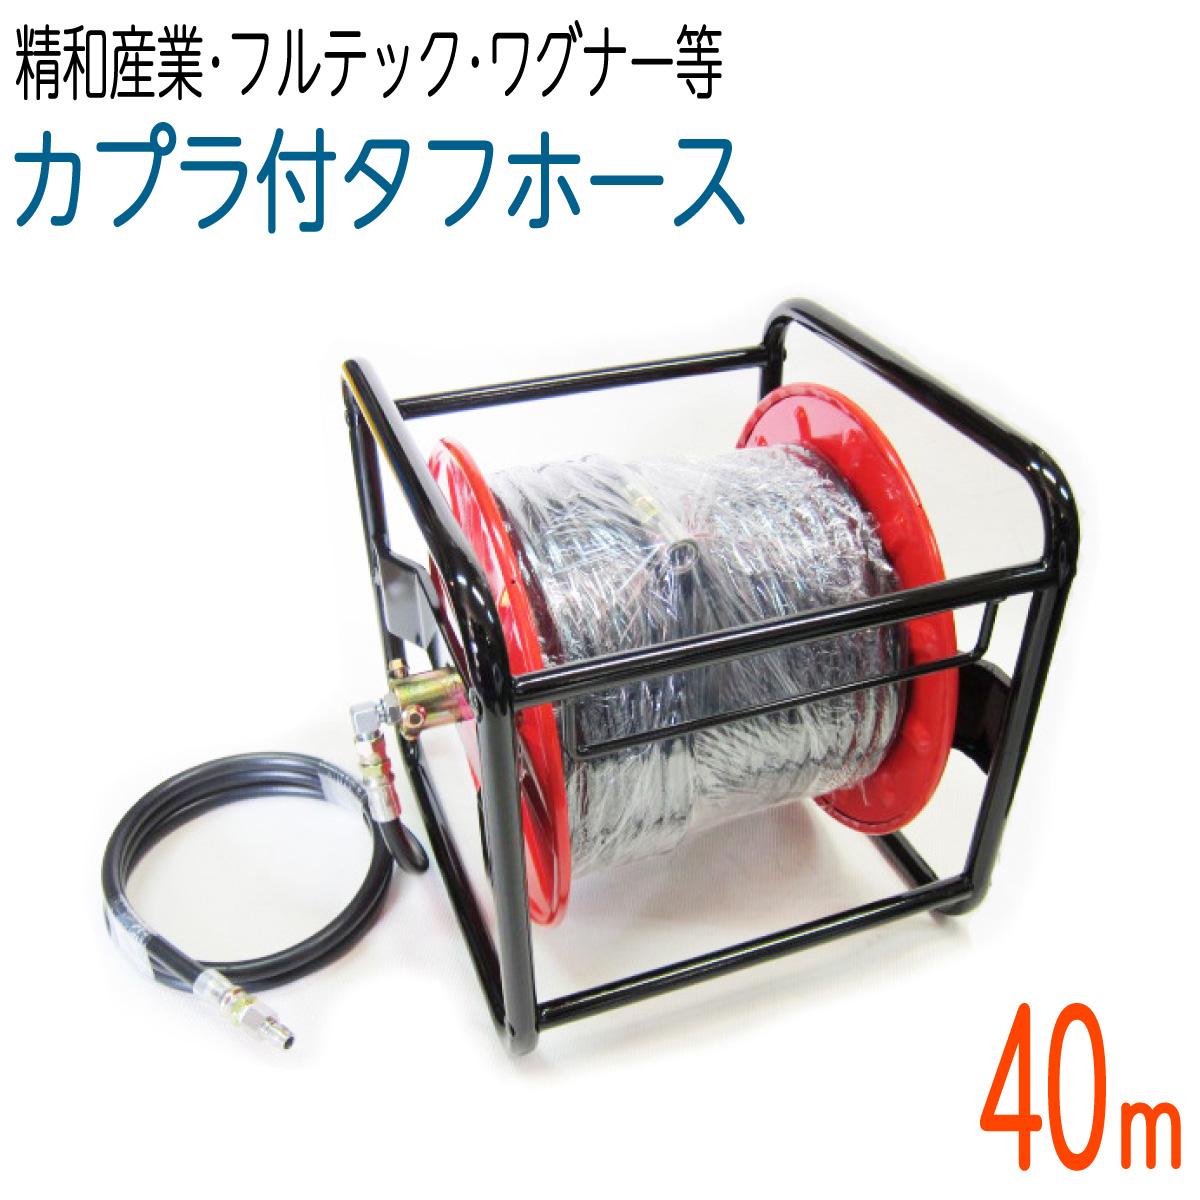 【40Mリール巻き】3/8(3分) ワンタッチカプラ付高圧洗浄機 タフホース